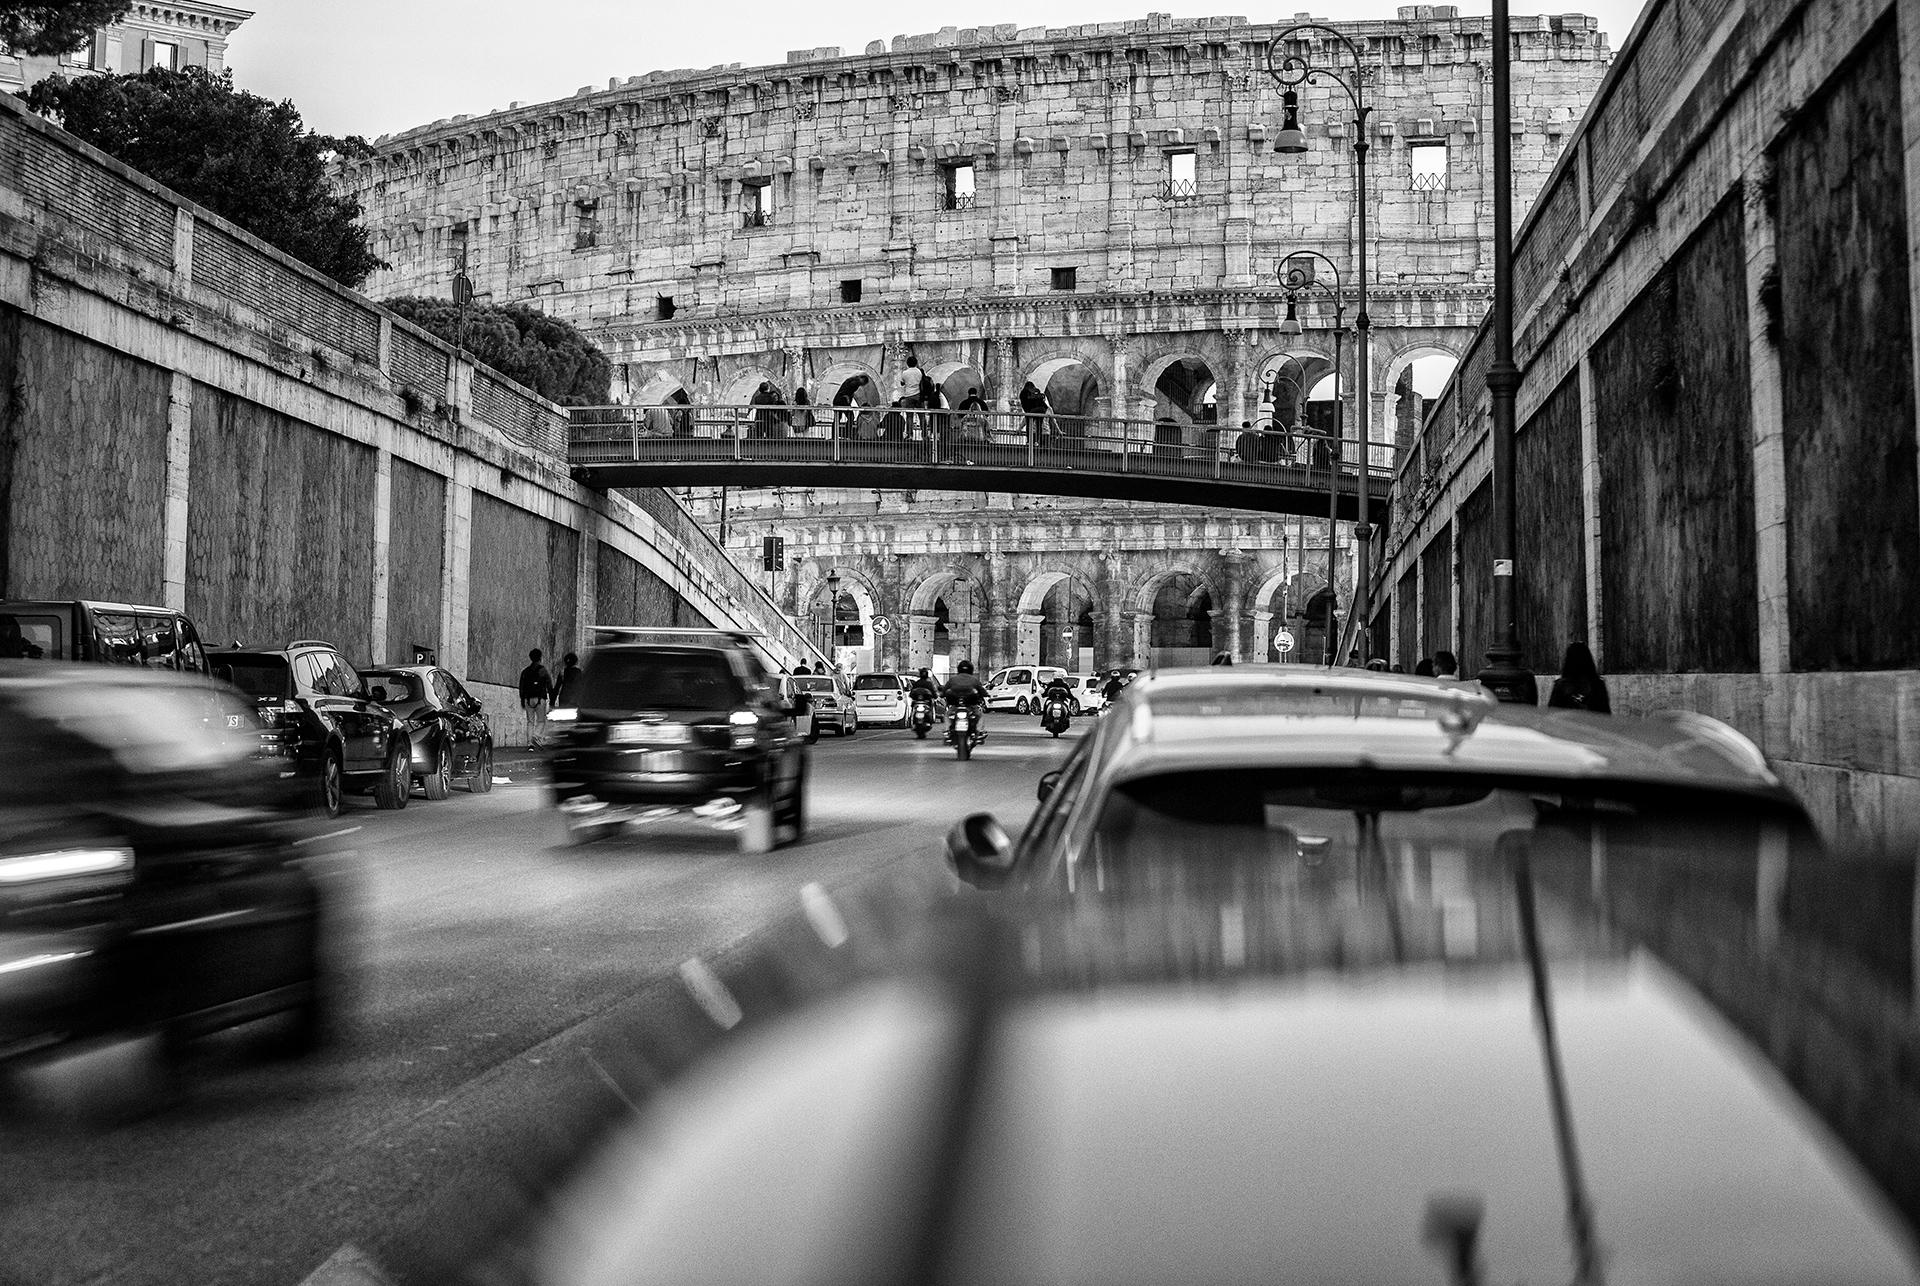 Roman Colosseum, Italy, Colosseo, Rome